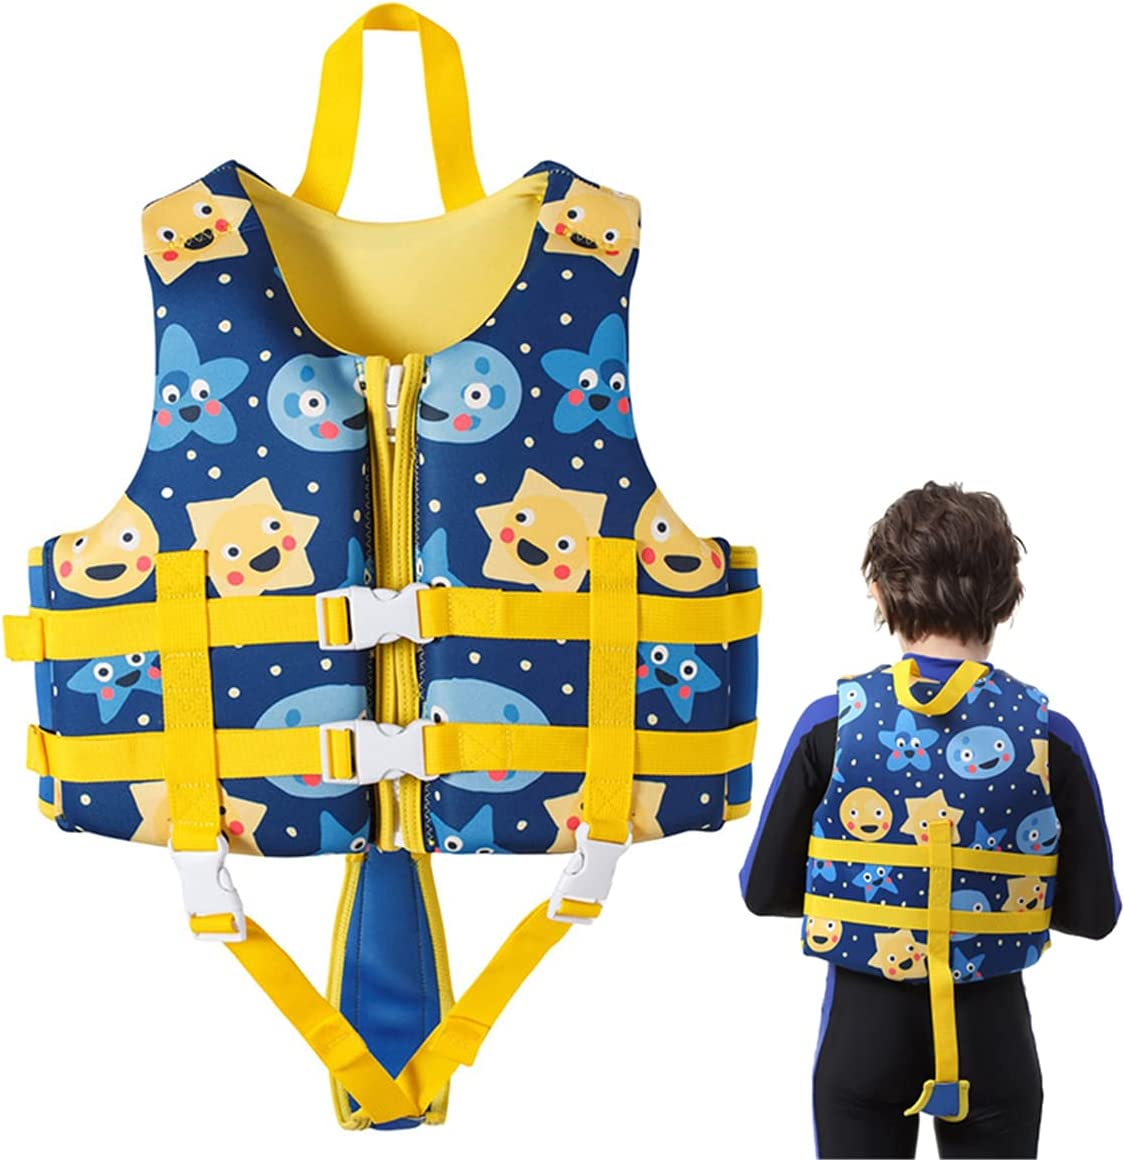 HWZZ Kids Swim Vest Save Max 65% OFF money Jackets Swimming Children Neoprene